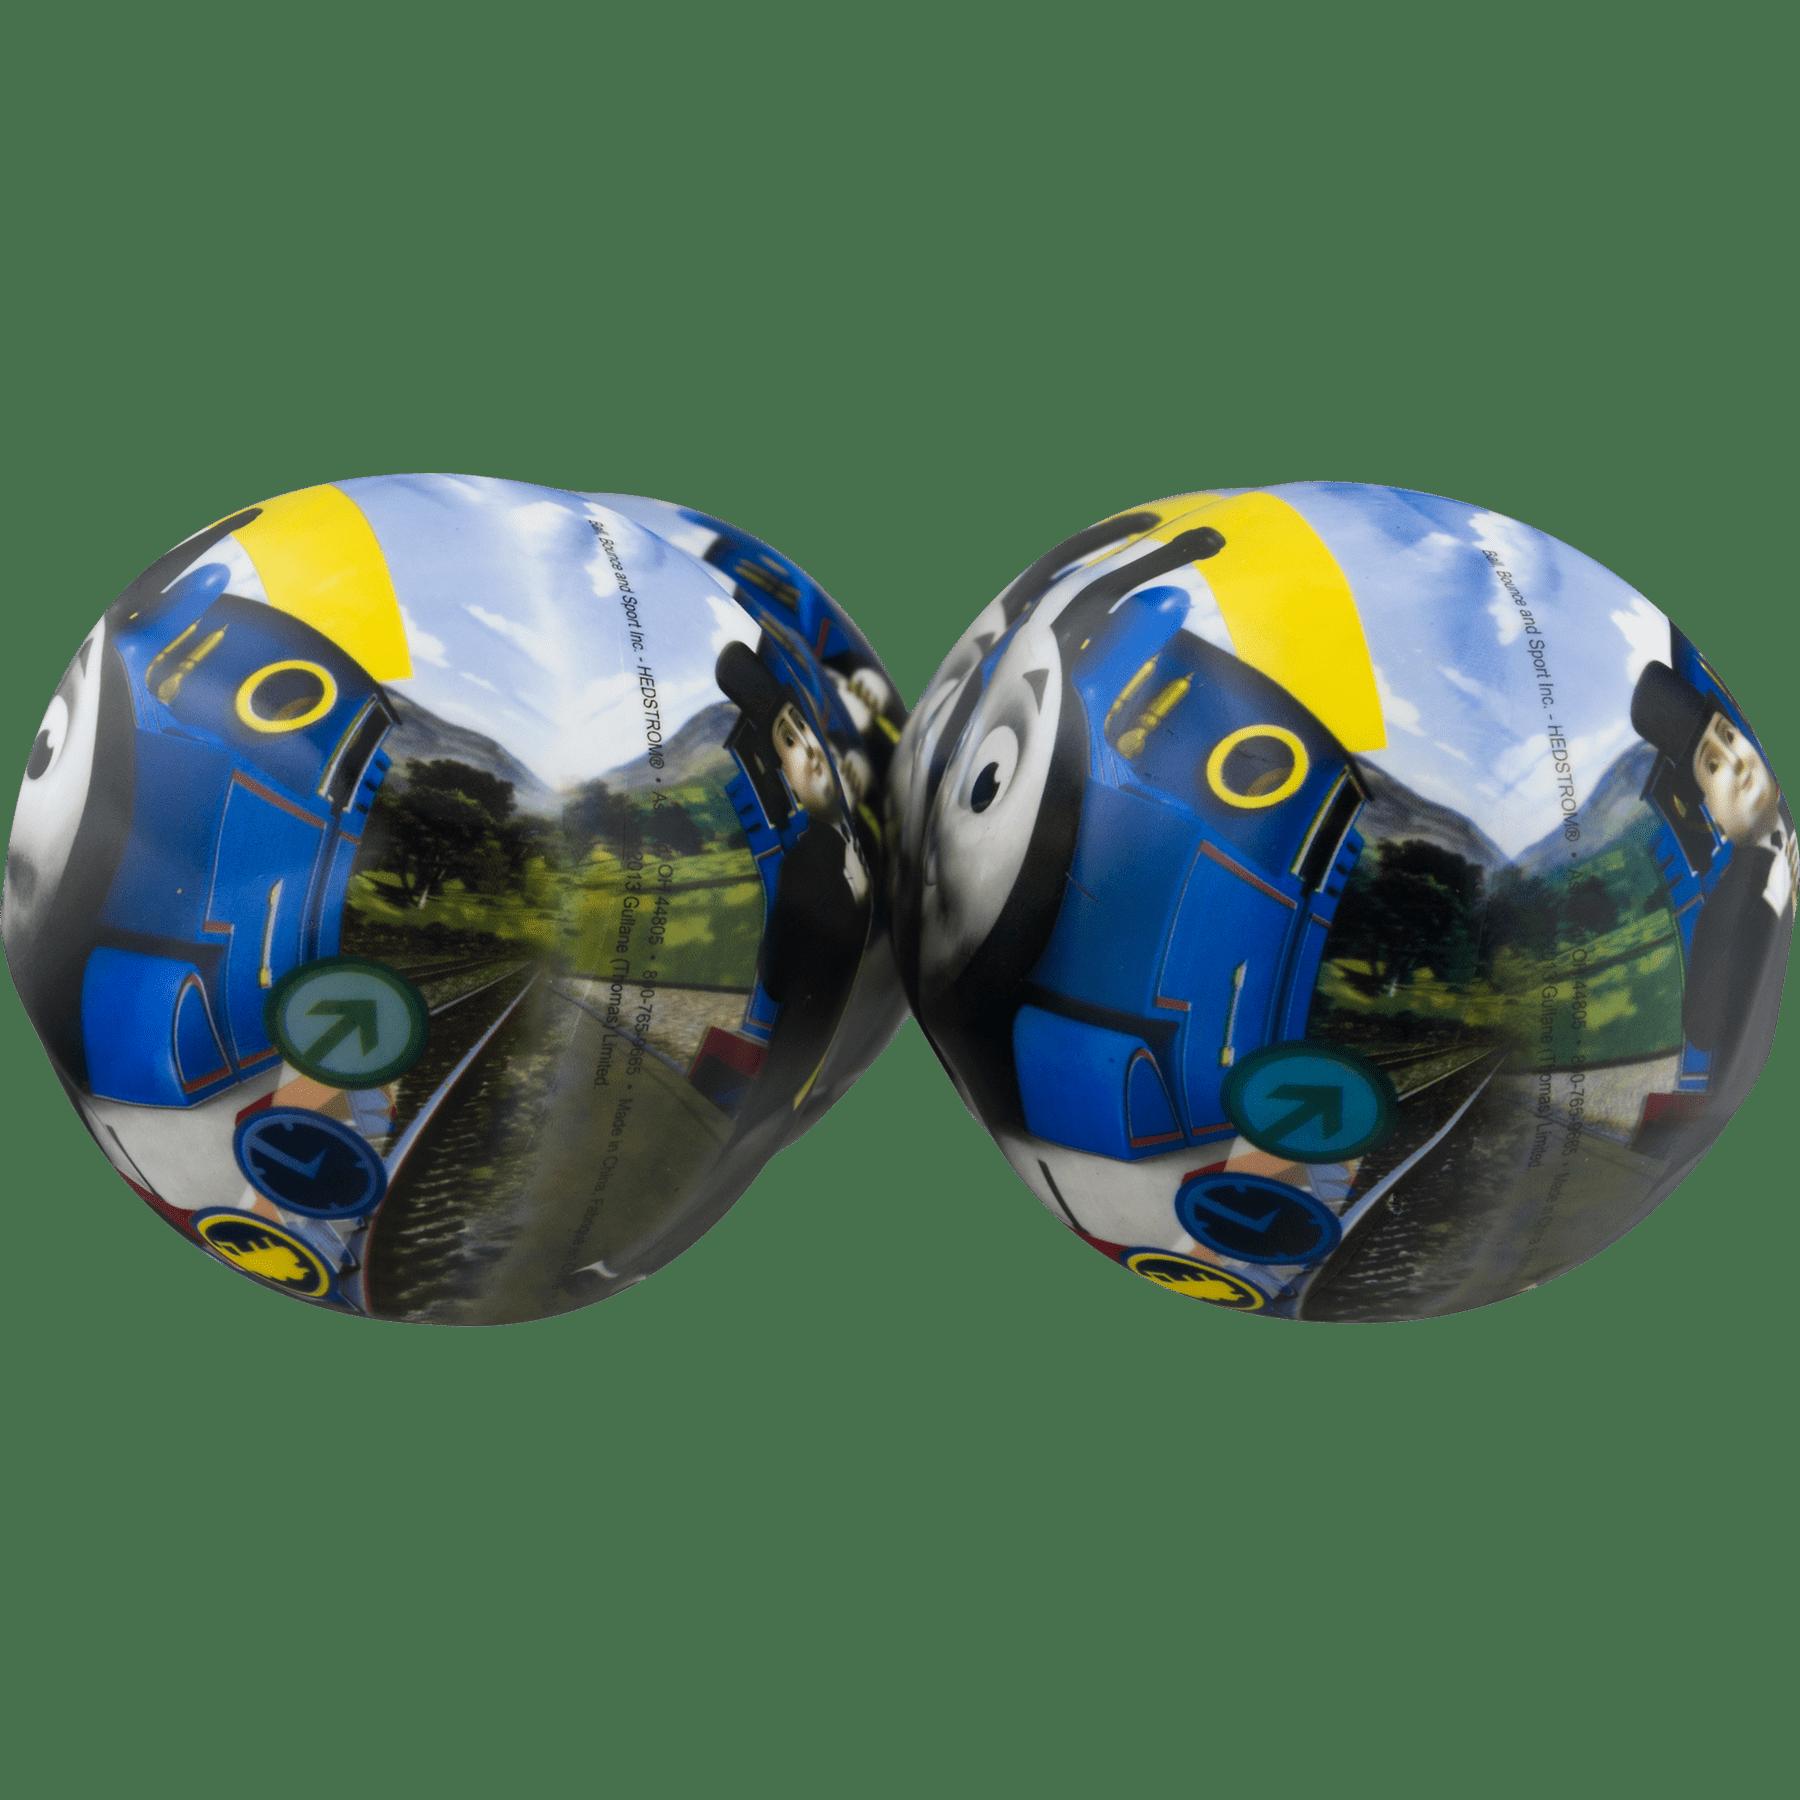 THOMAS THE TANK ENGINE Pack De 6 Fête Ballons Flambant Neuf Scellé